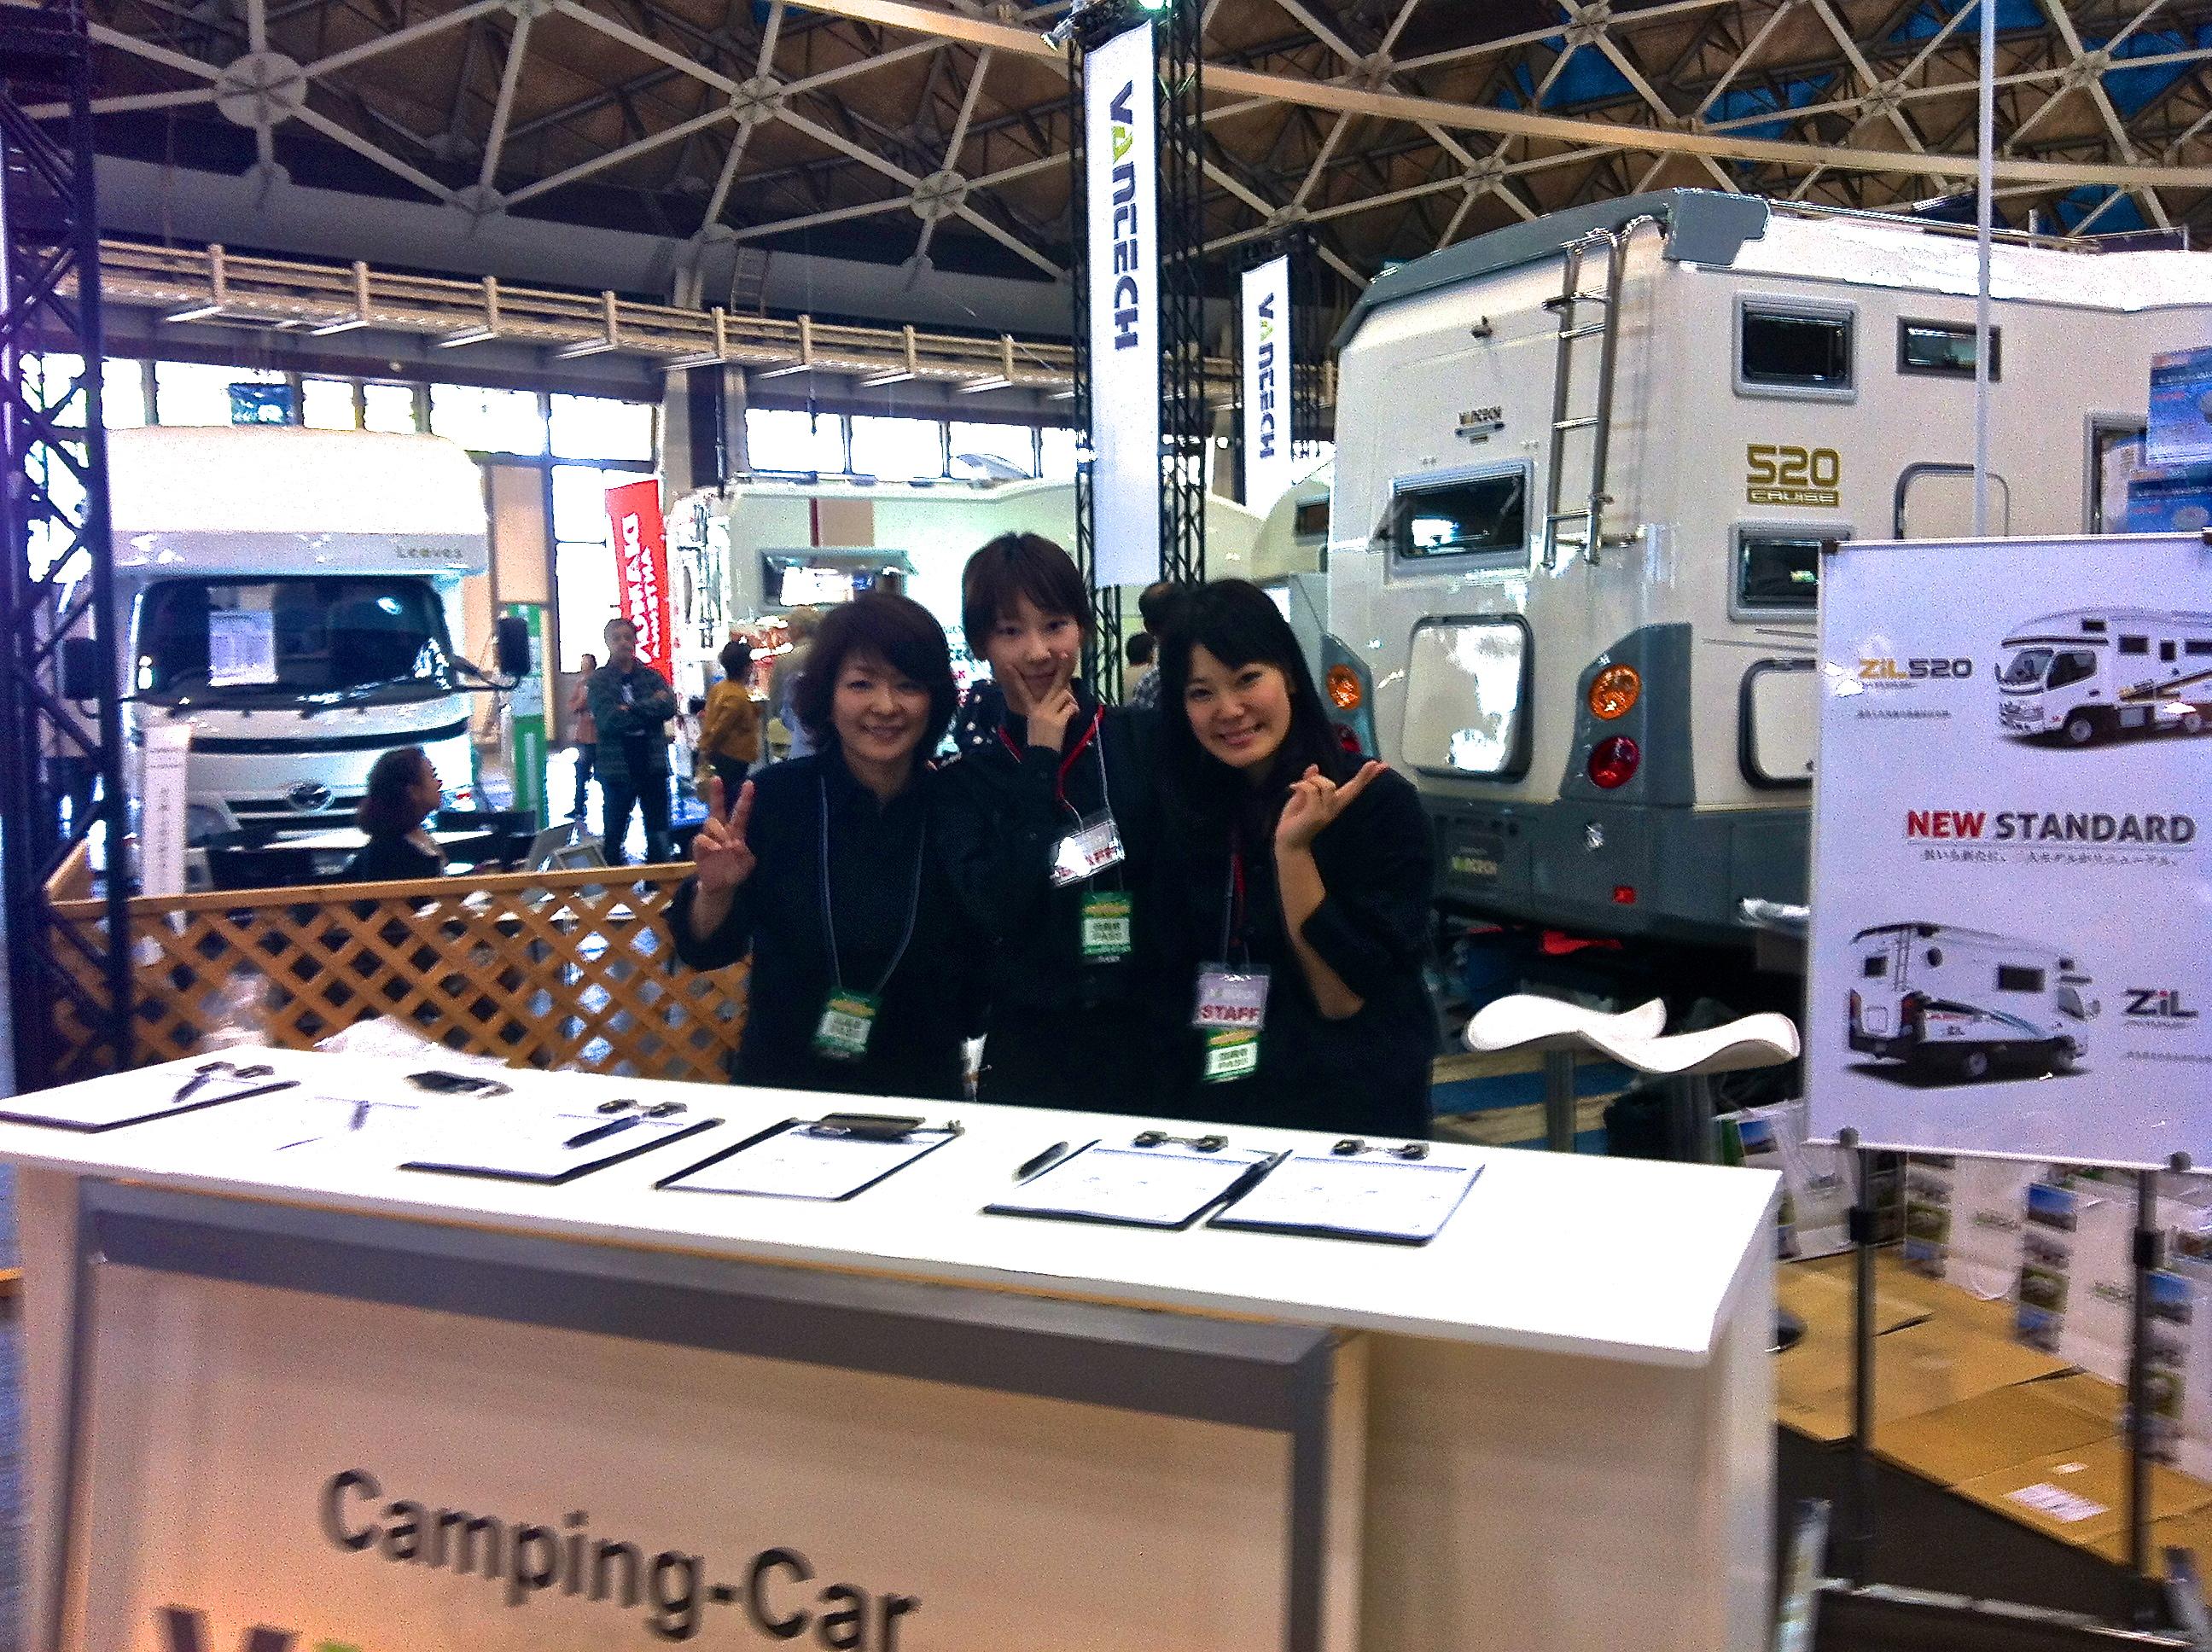 http://www.vantech.jp/shops/info/IMG_0468.JPG